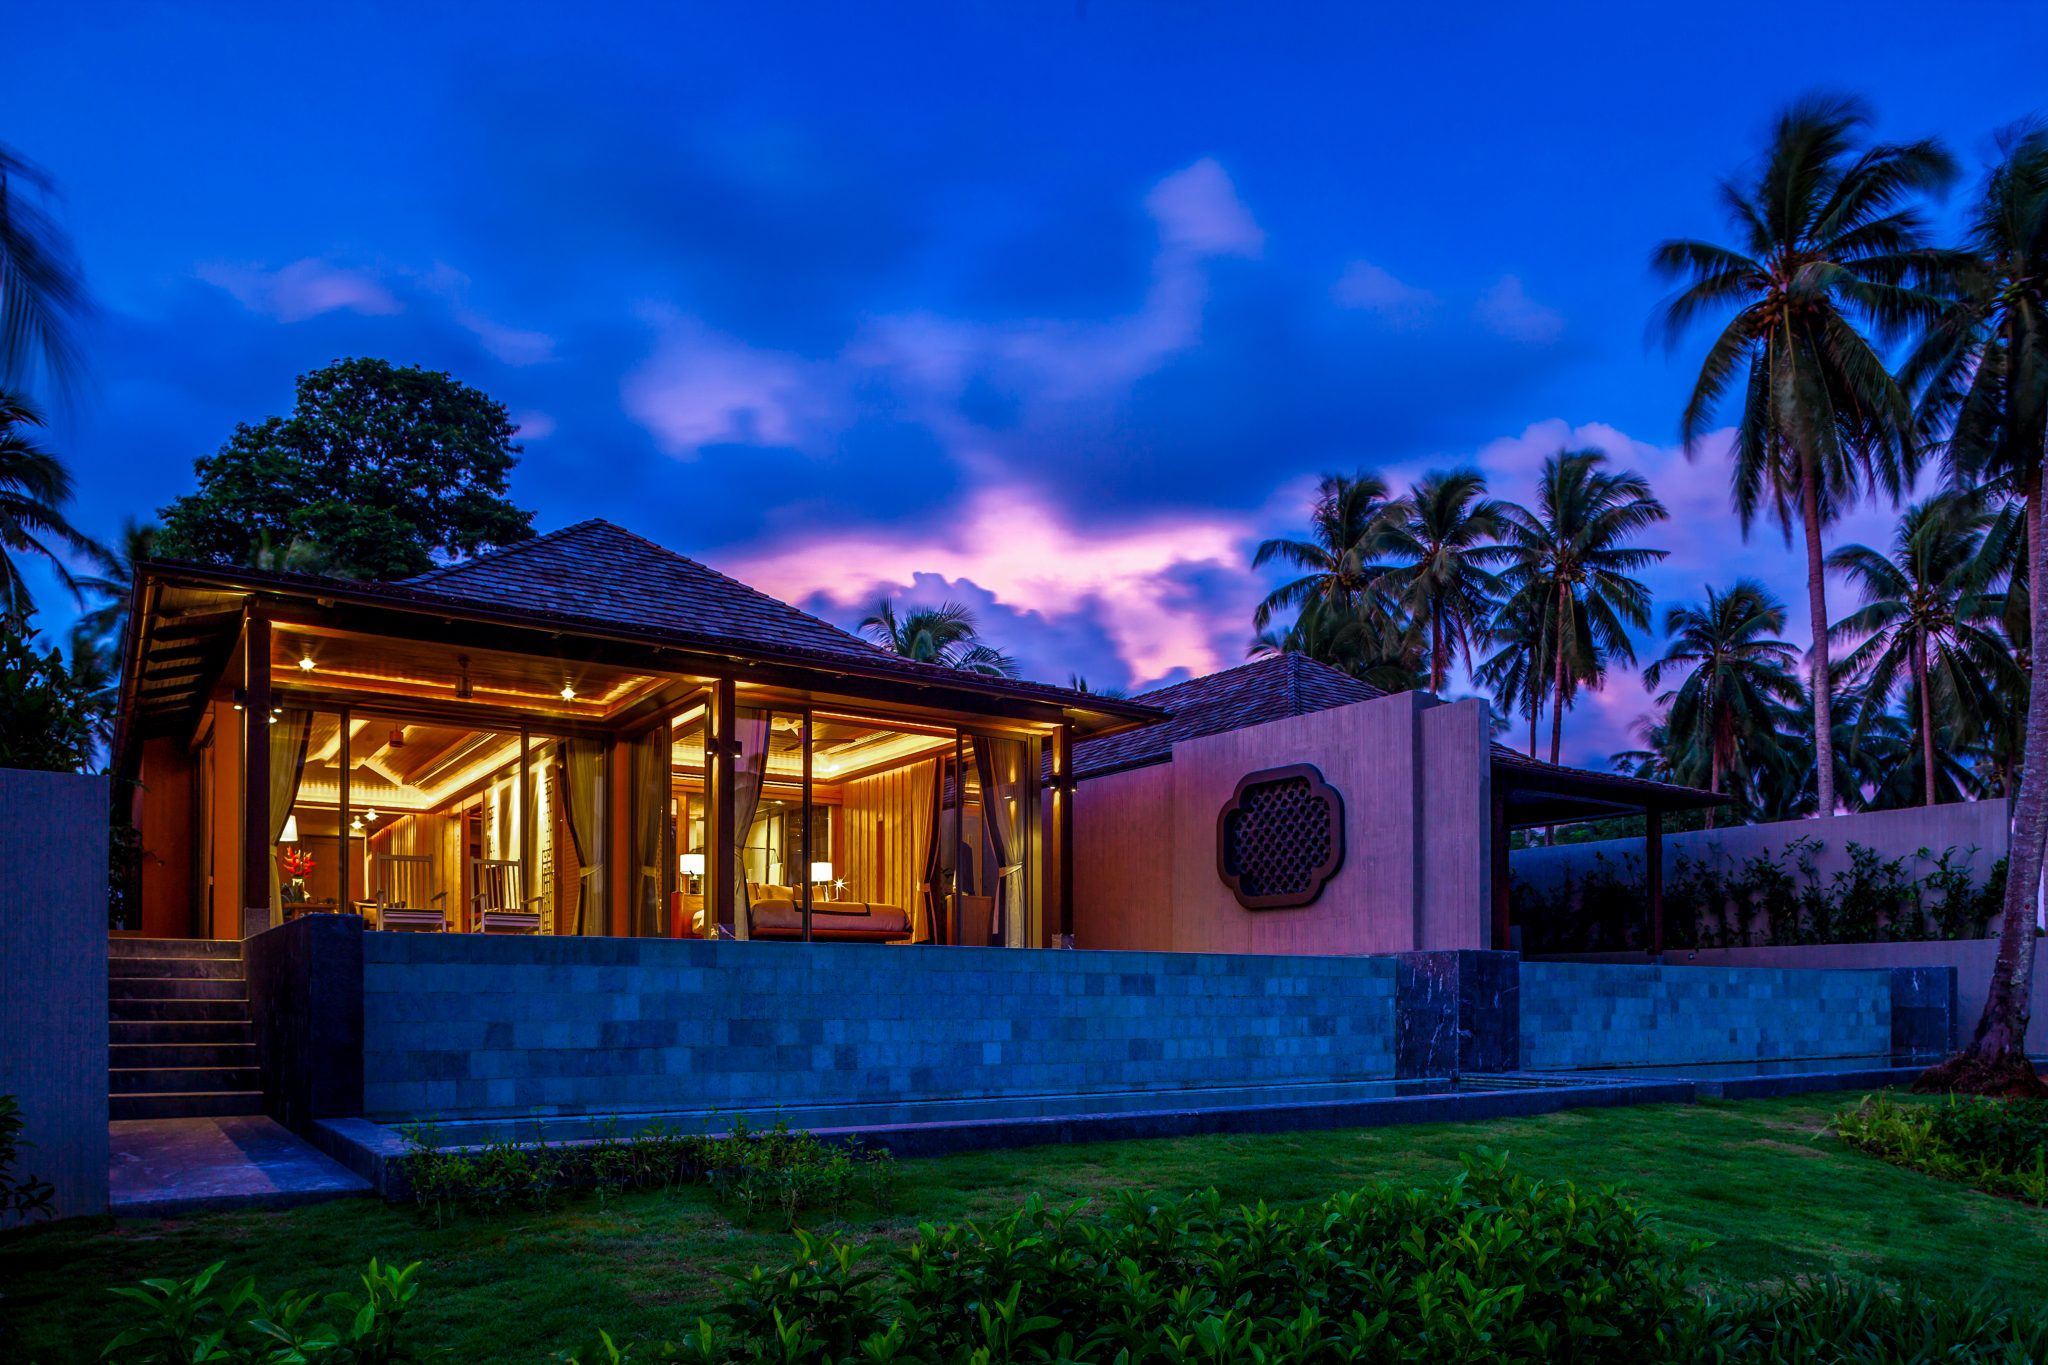 Phuket Real Estate Agency – Natai Beach (1)